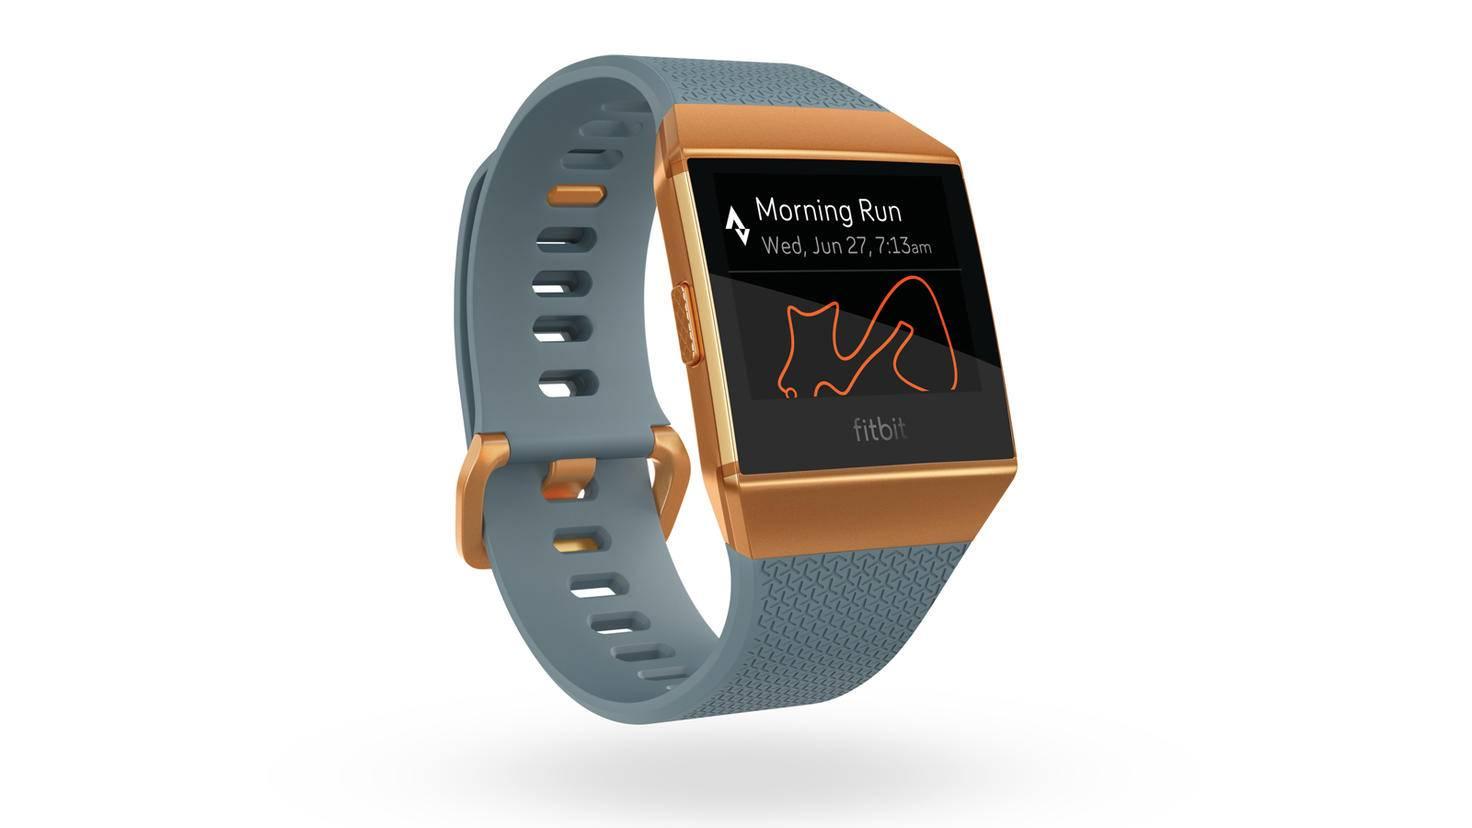 Fitbit_Ionic_3QTR_Burnt_Orange_Slate_Blue_Strava_Run